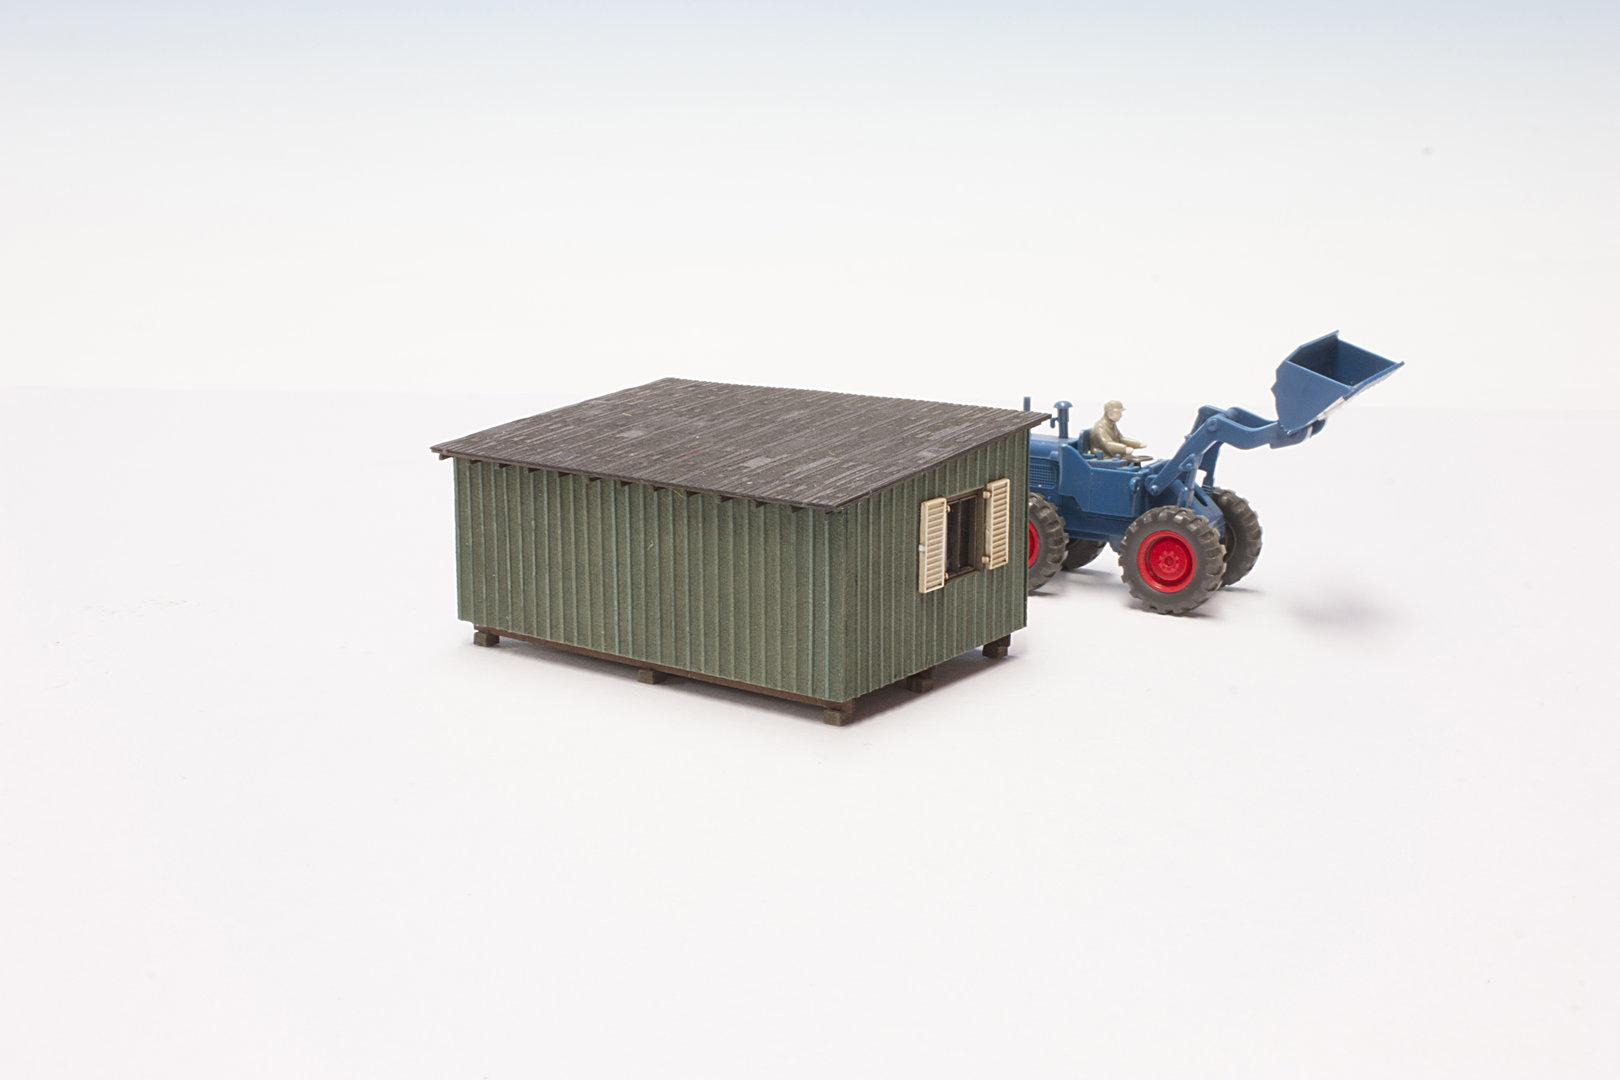 gartenhaus mit veranda h0 lasercut welten joswood gmbh. Black Bedroom Furniture Sets. Home Design Ideas